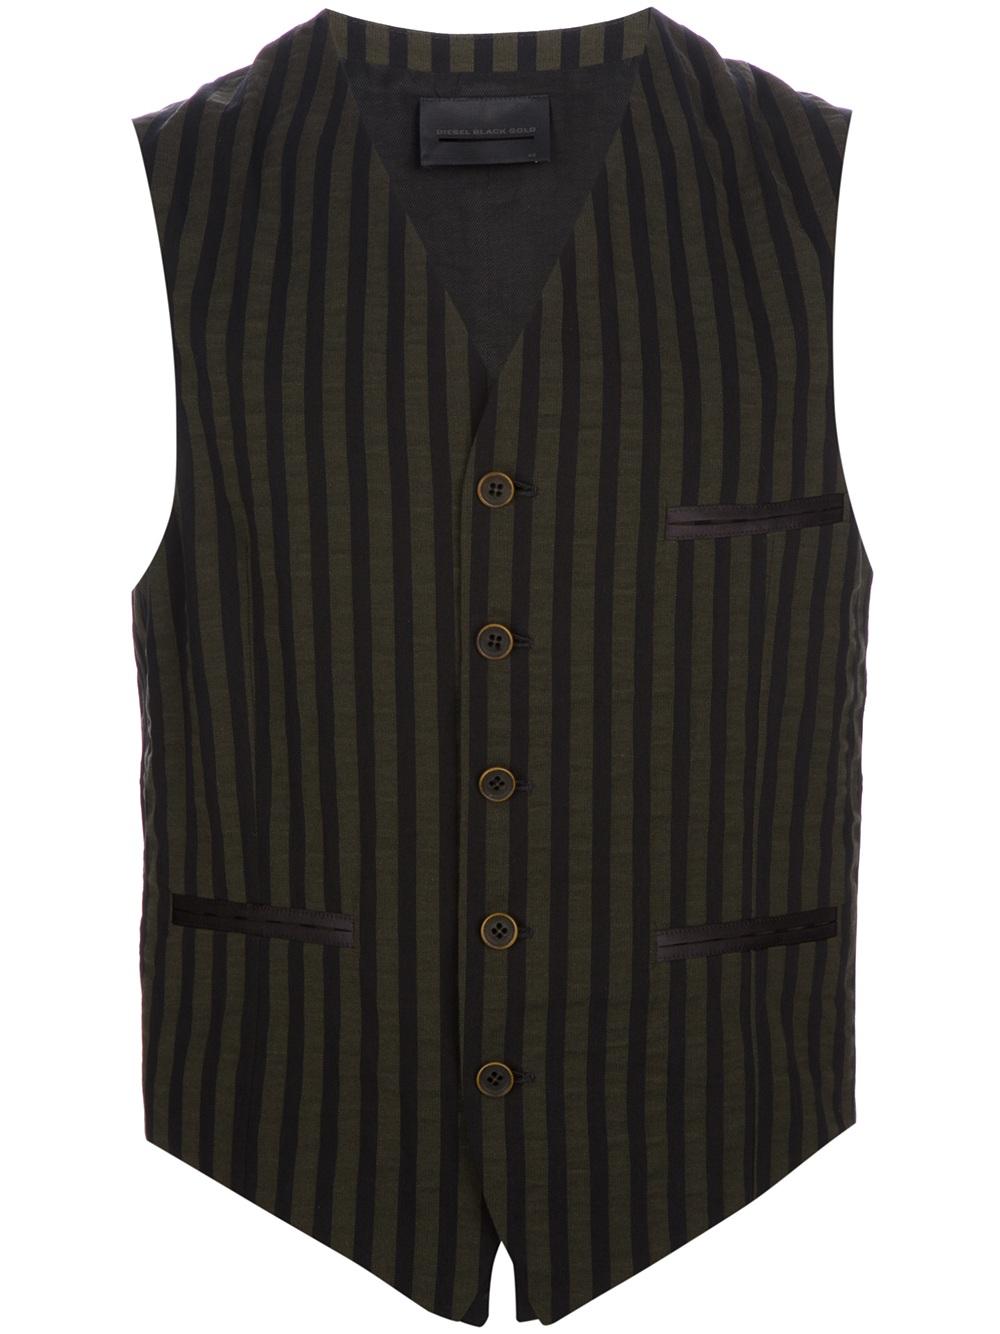 Diesel black gold Striped Waistcoat in Black for Men